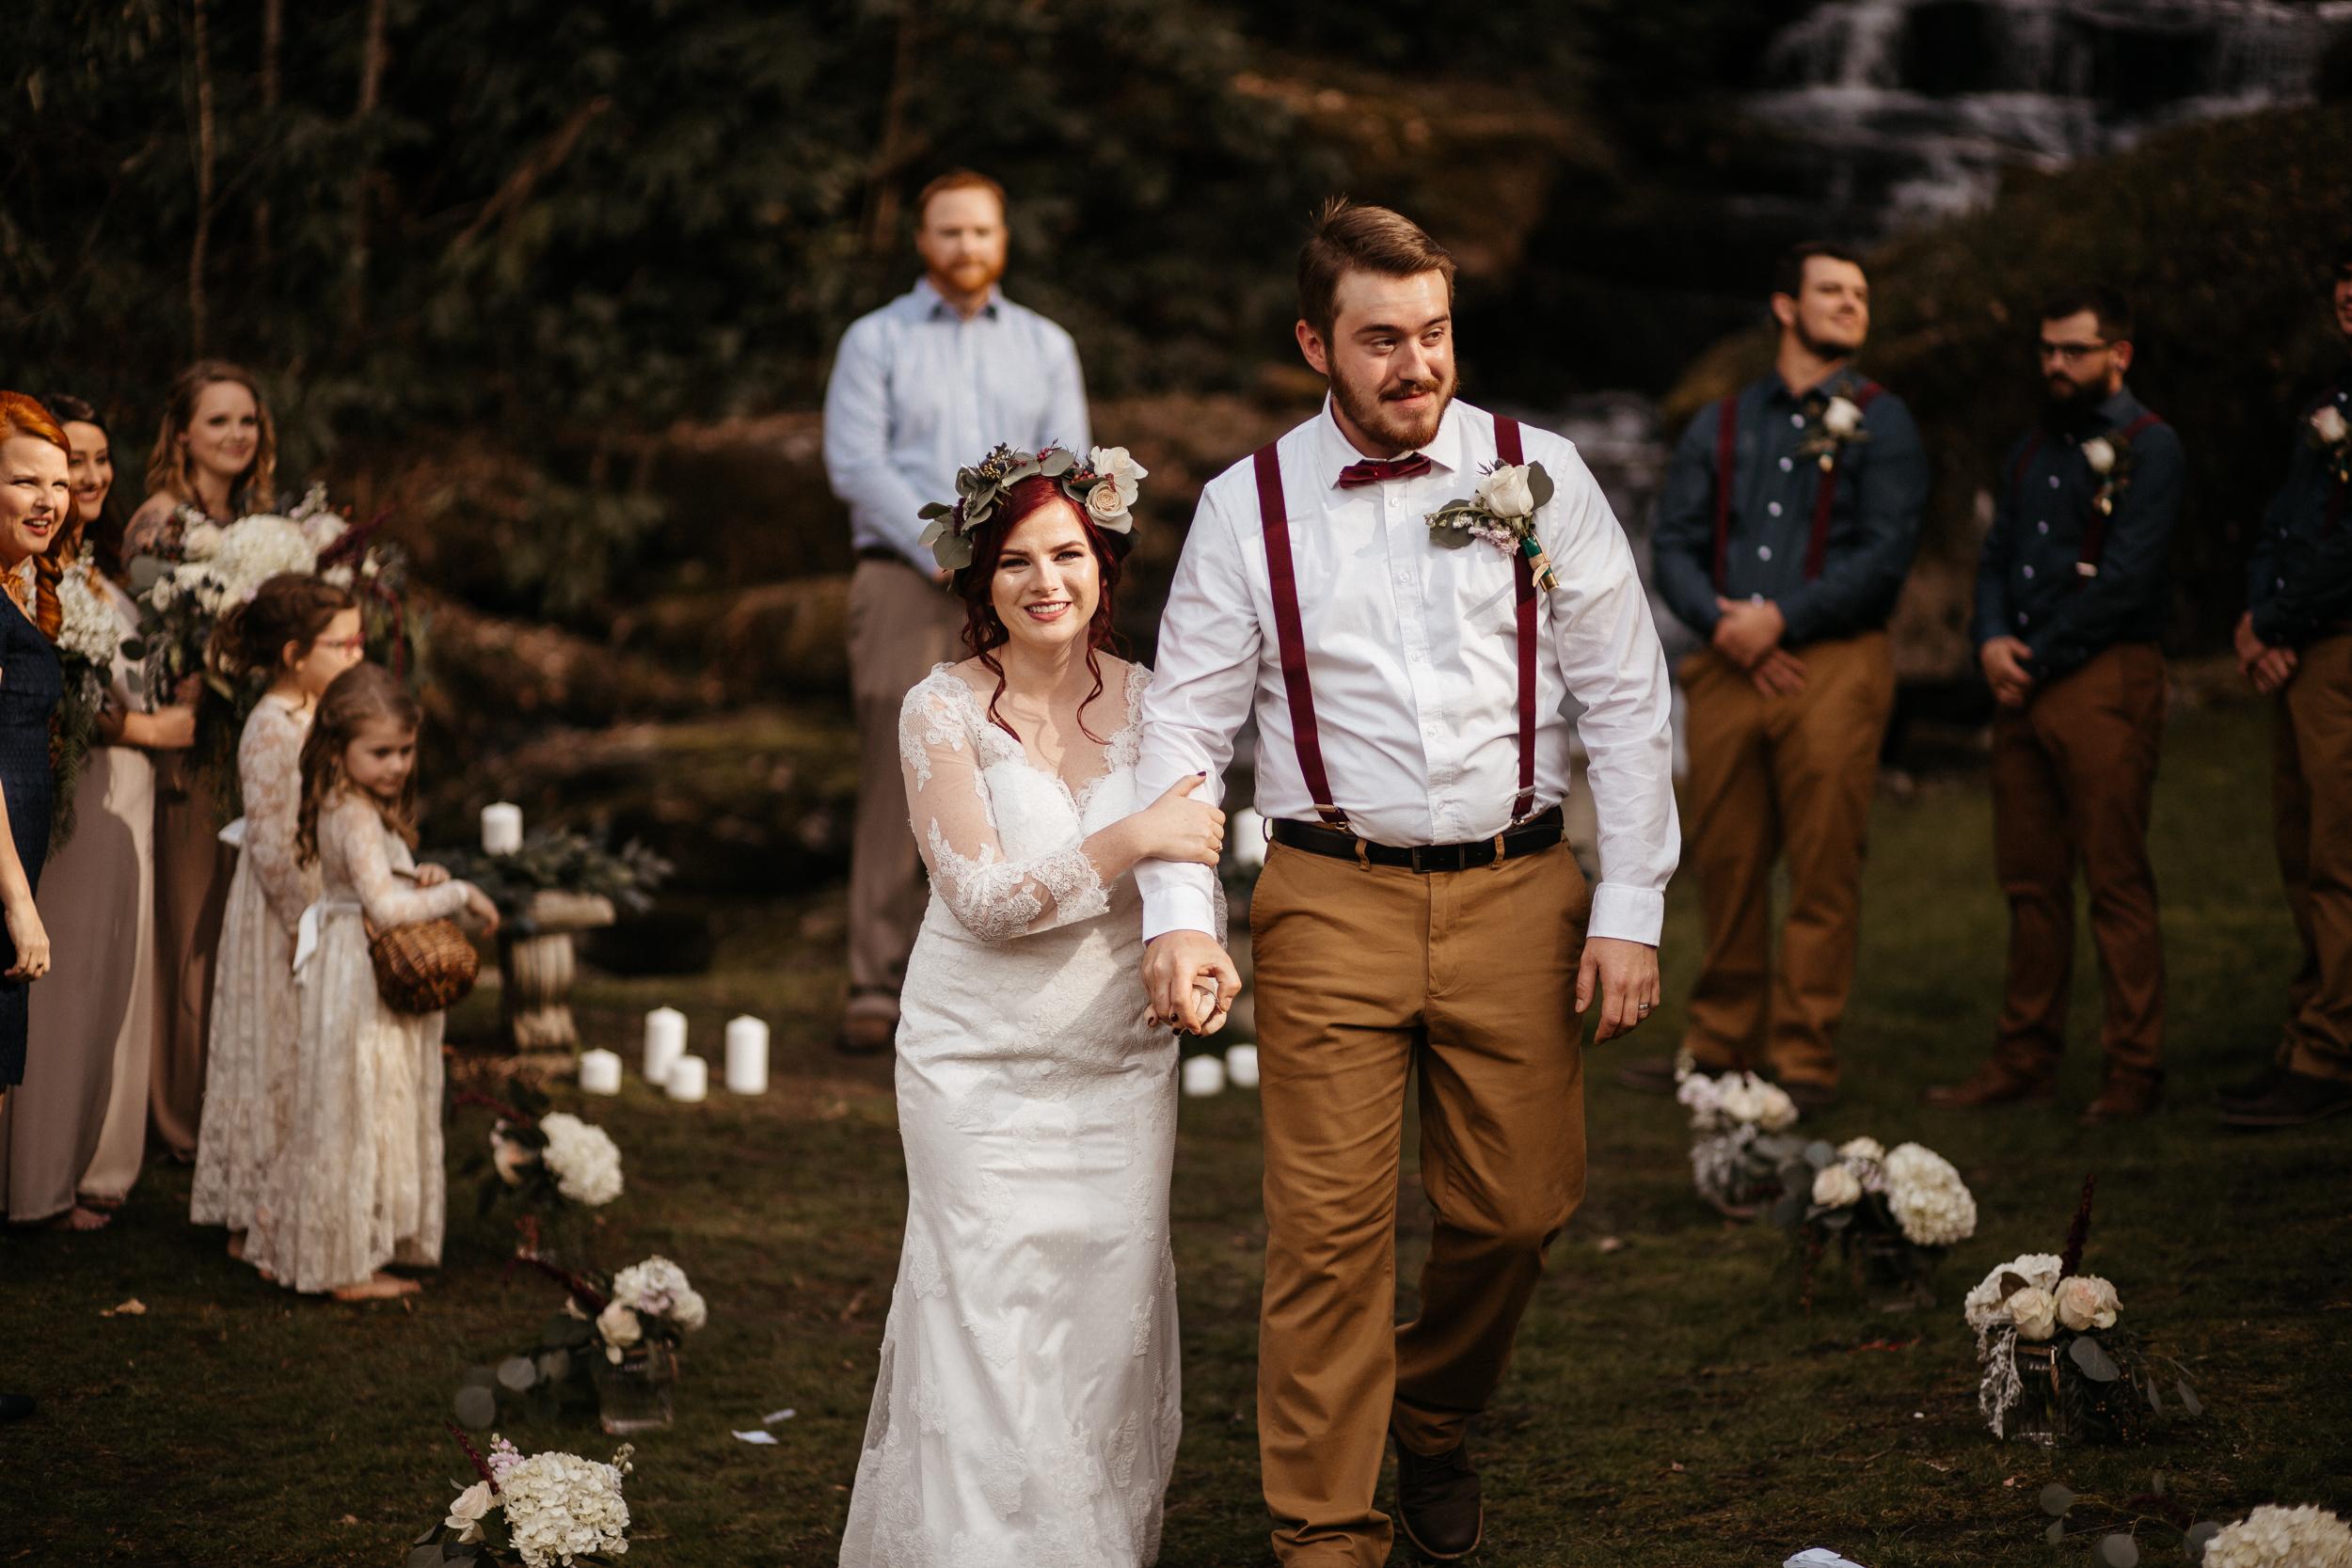 memphis-gatlinburg-tennessee-wedding-photographer-the-hatches-utah-colorado-washington-arizona-oregon-yosemite-national-park-elopement-adventure-emotional-journalistic-bohemian-florals-minimalistic-woodland-waterfall